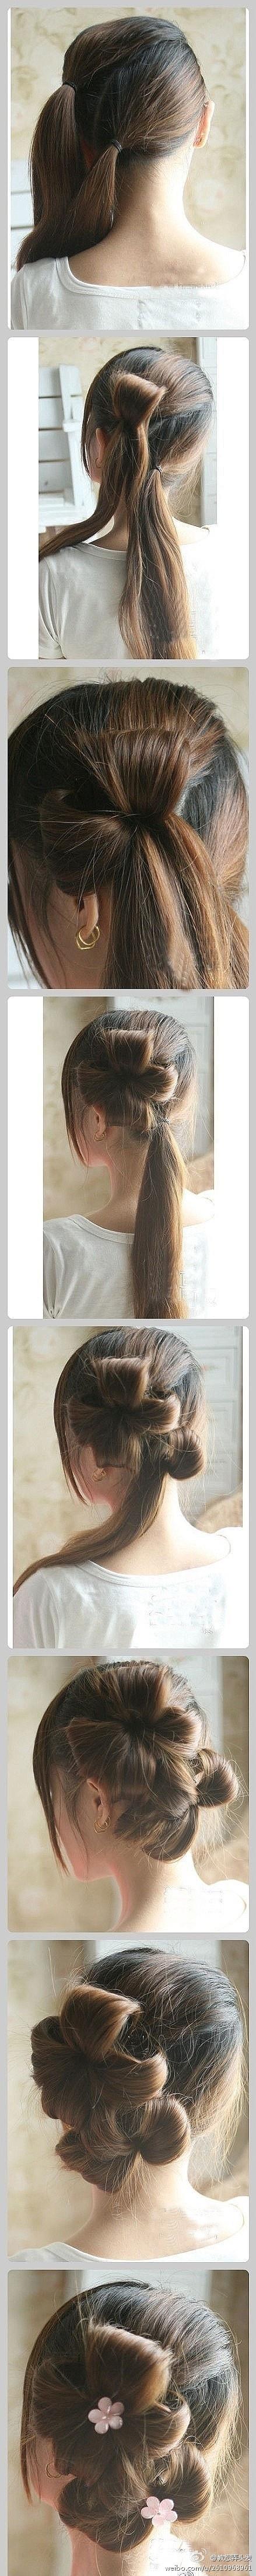 DIY hair updo